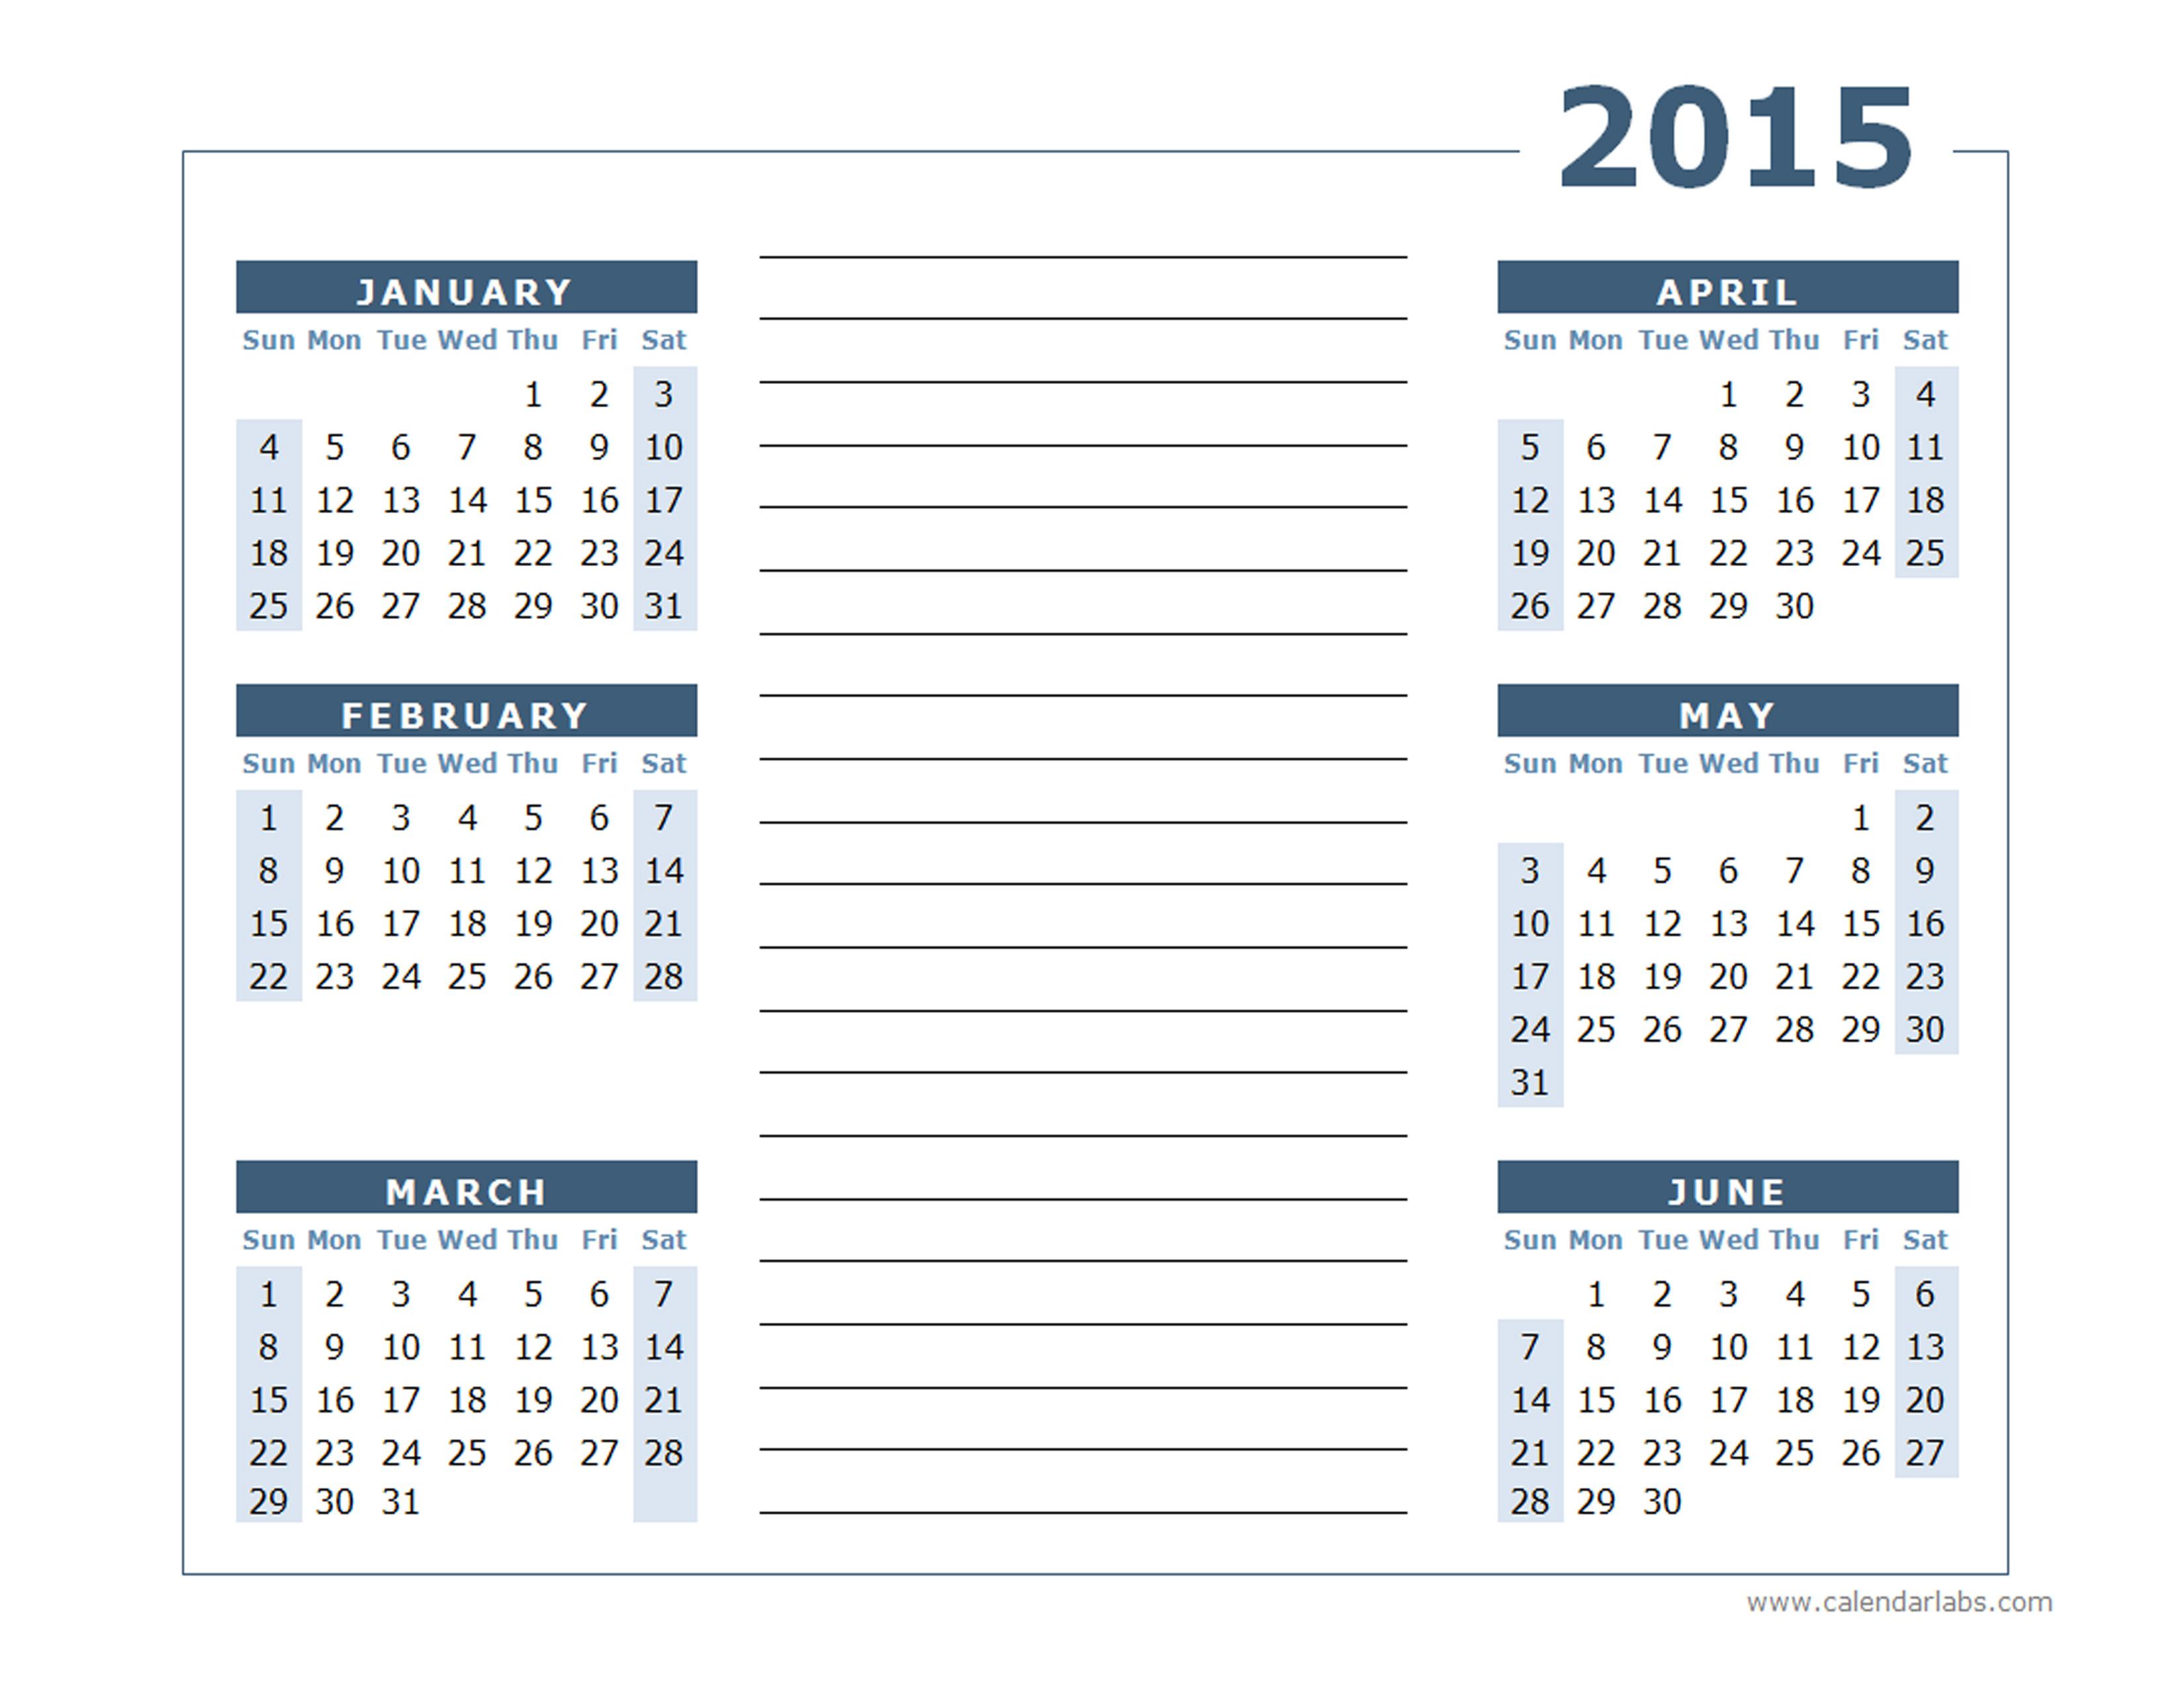 calendar 2015 uk 16 free printable word templates